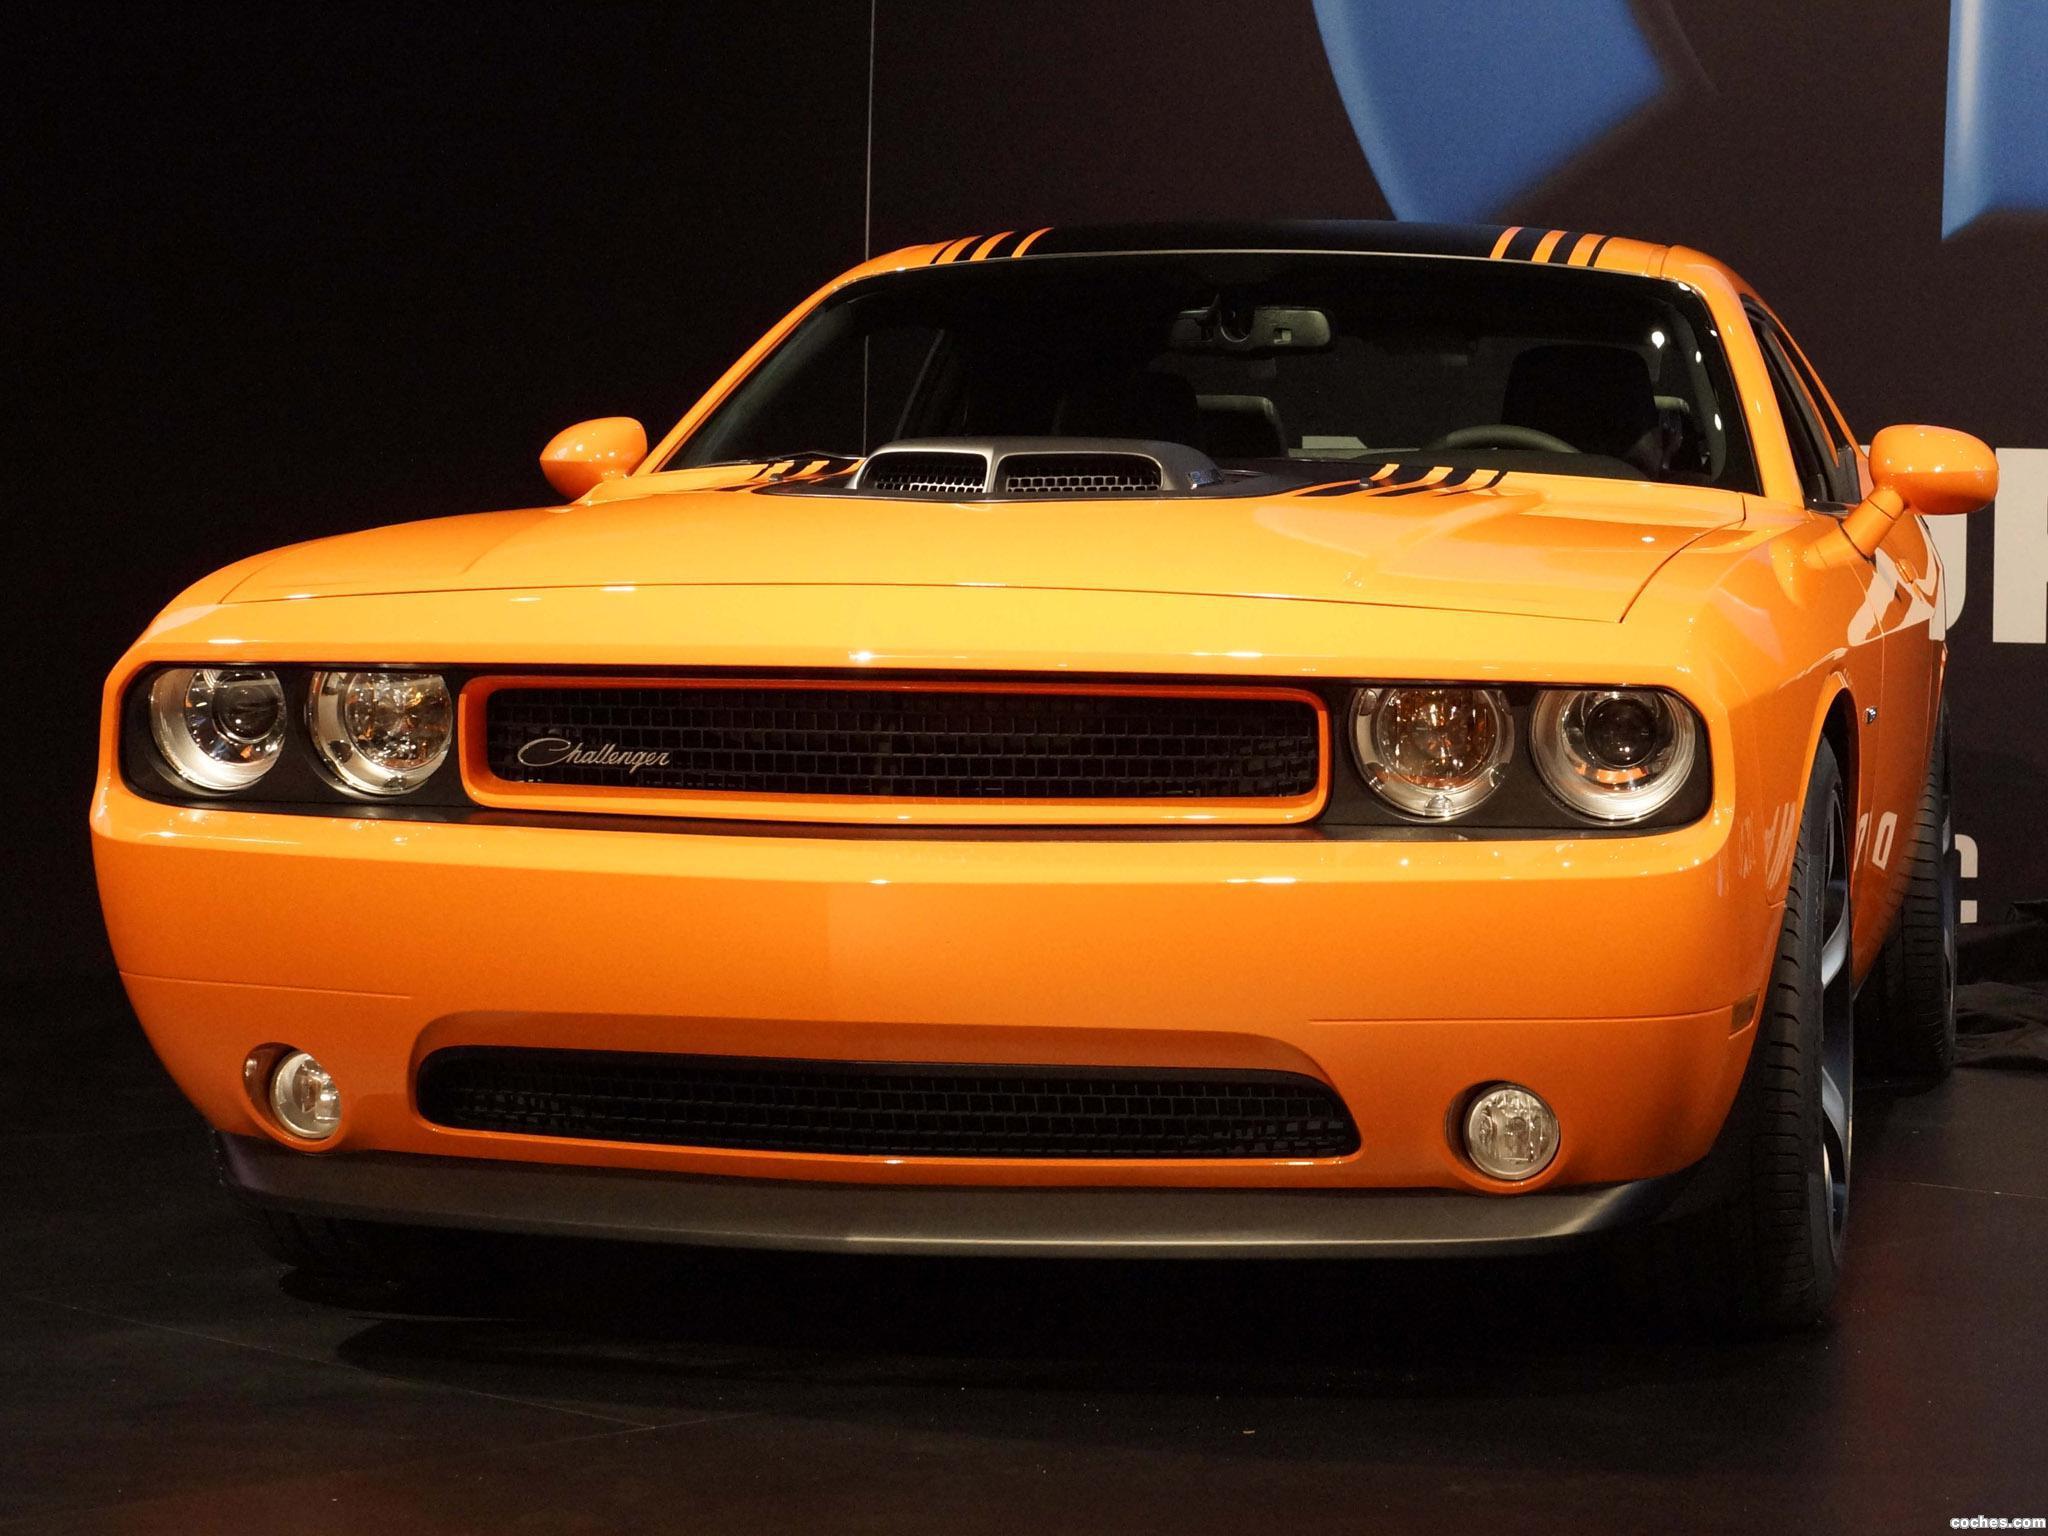 2010 Dodge Challenger RT Shaker photo - 3